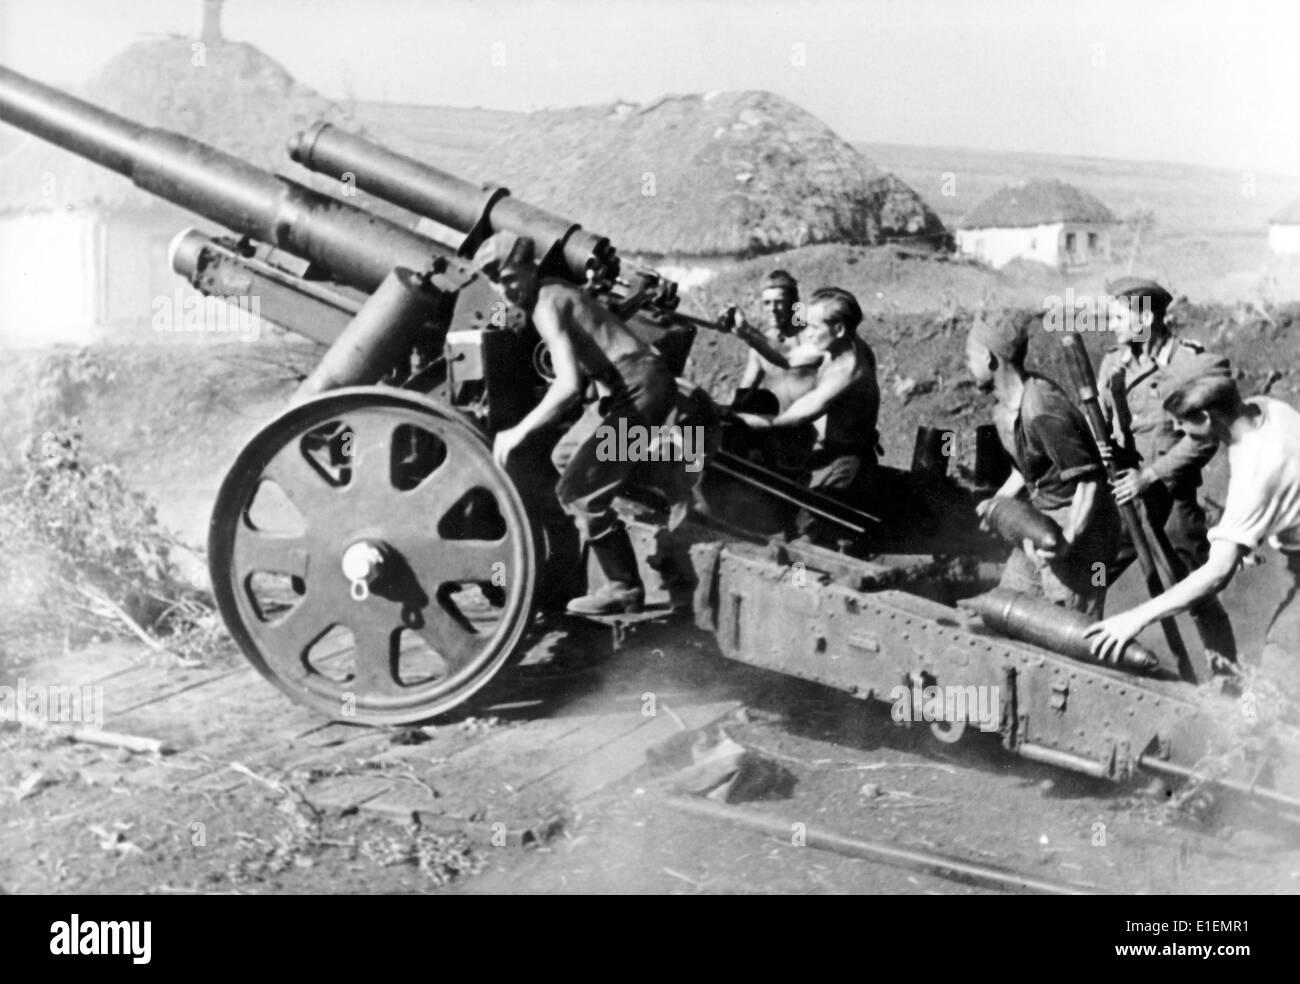 WW2 German Wehrmacht Artillery Combat Scene Picture